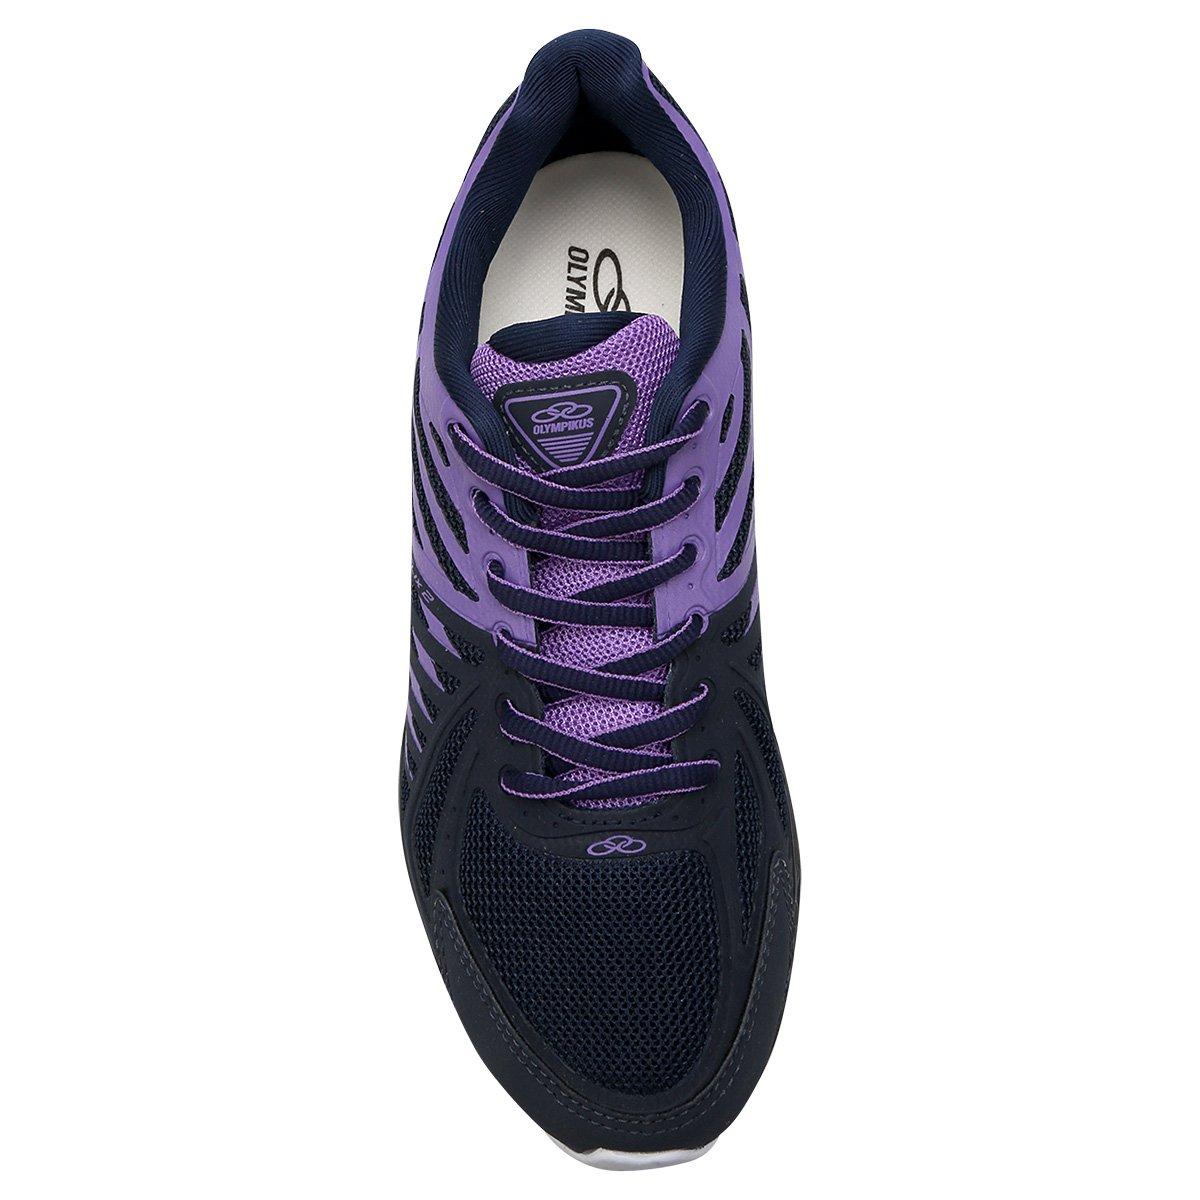 8bb161999cafb7  Tênis Olympikus Flix 2 Feminino - Compre Agora Netshoes  48ed6d57b7ced9 ... 5528a9860d1cb